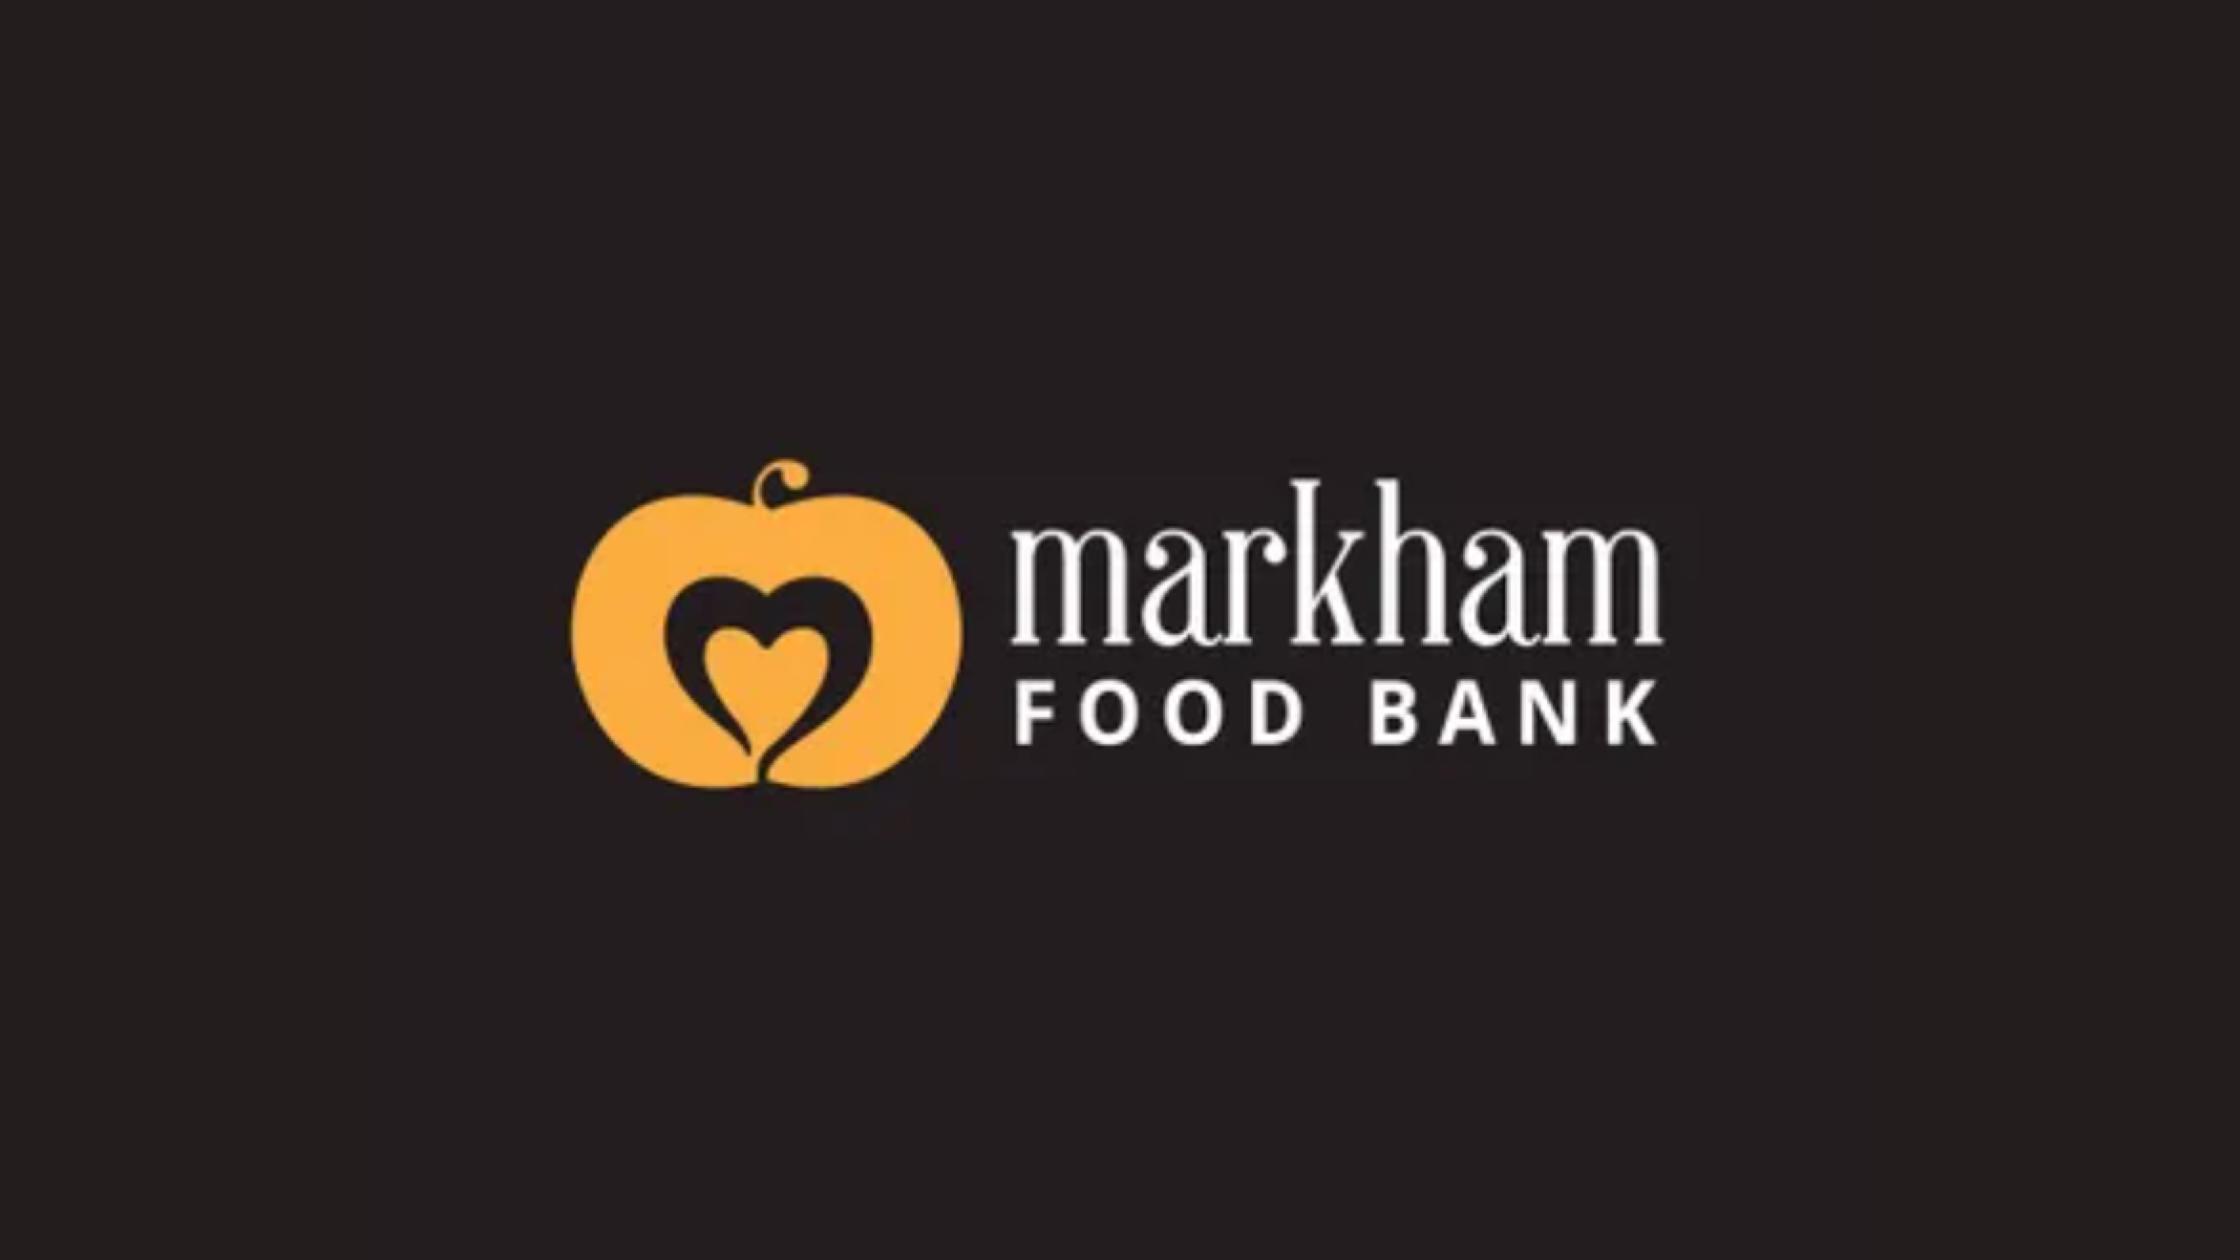 Markham Food Bank